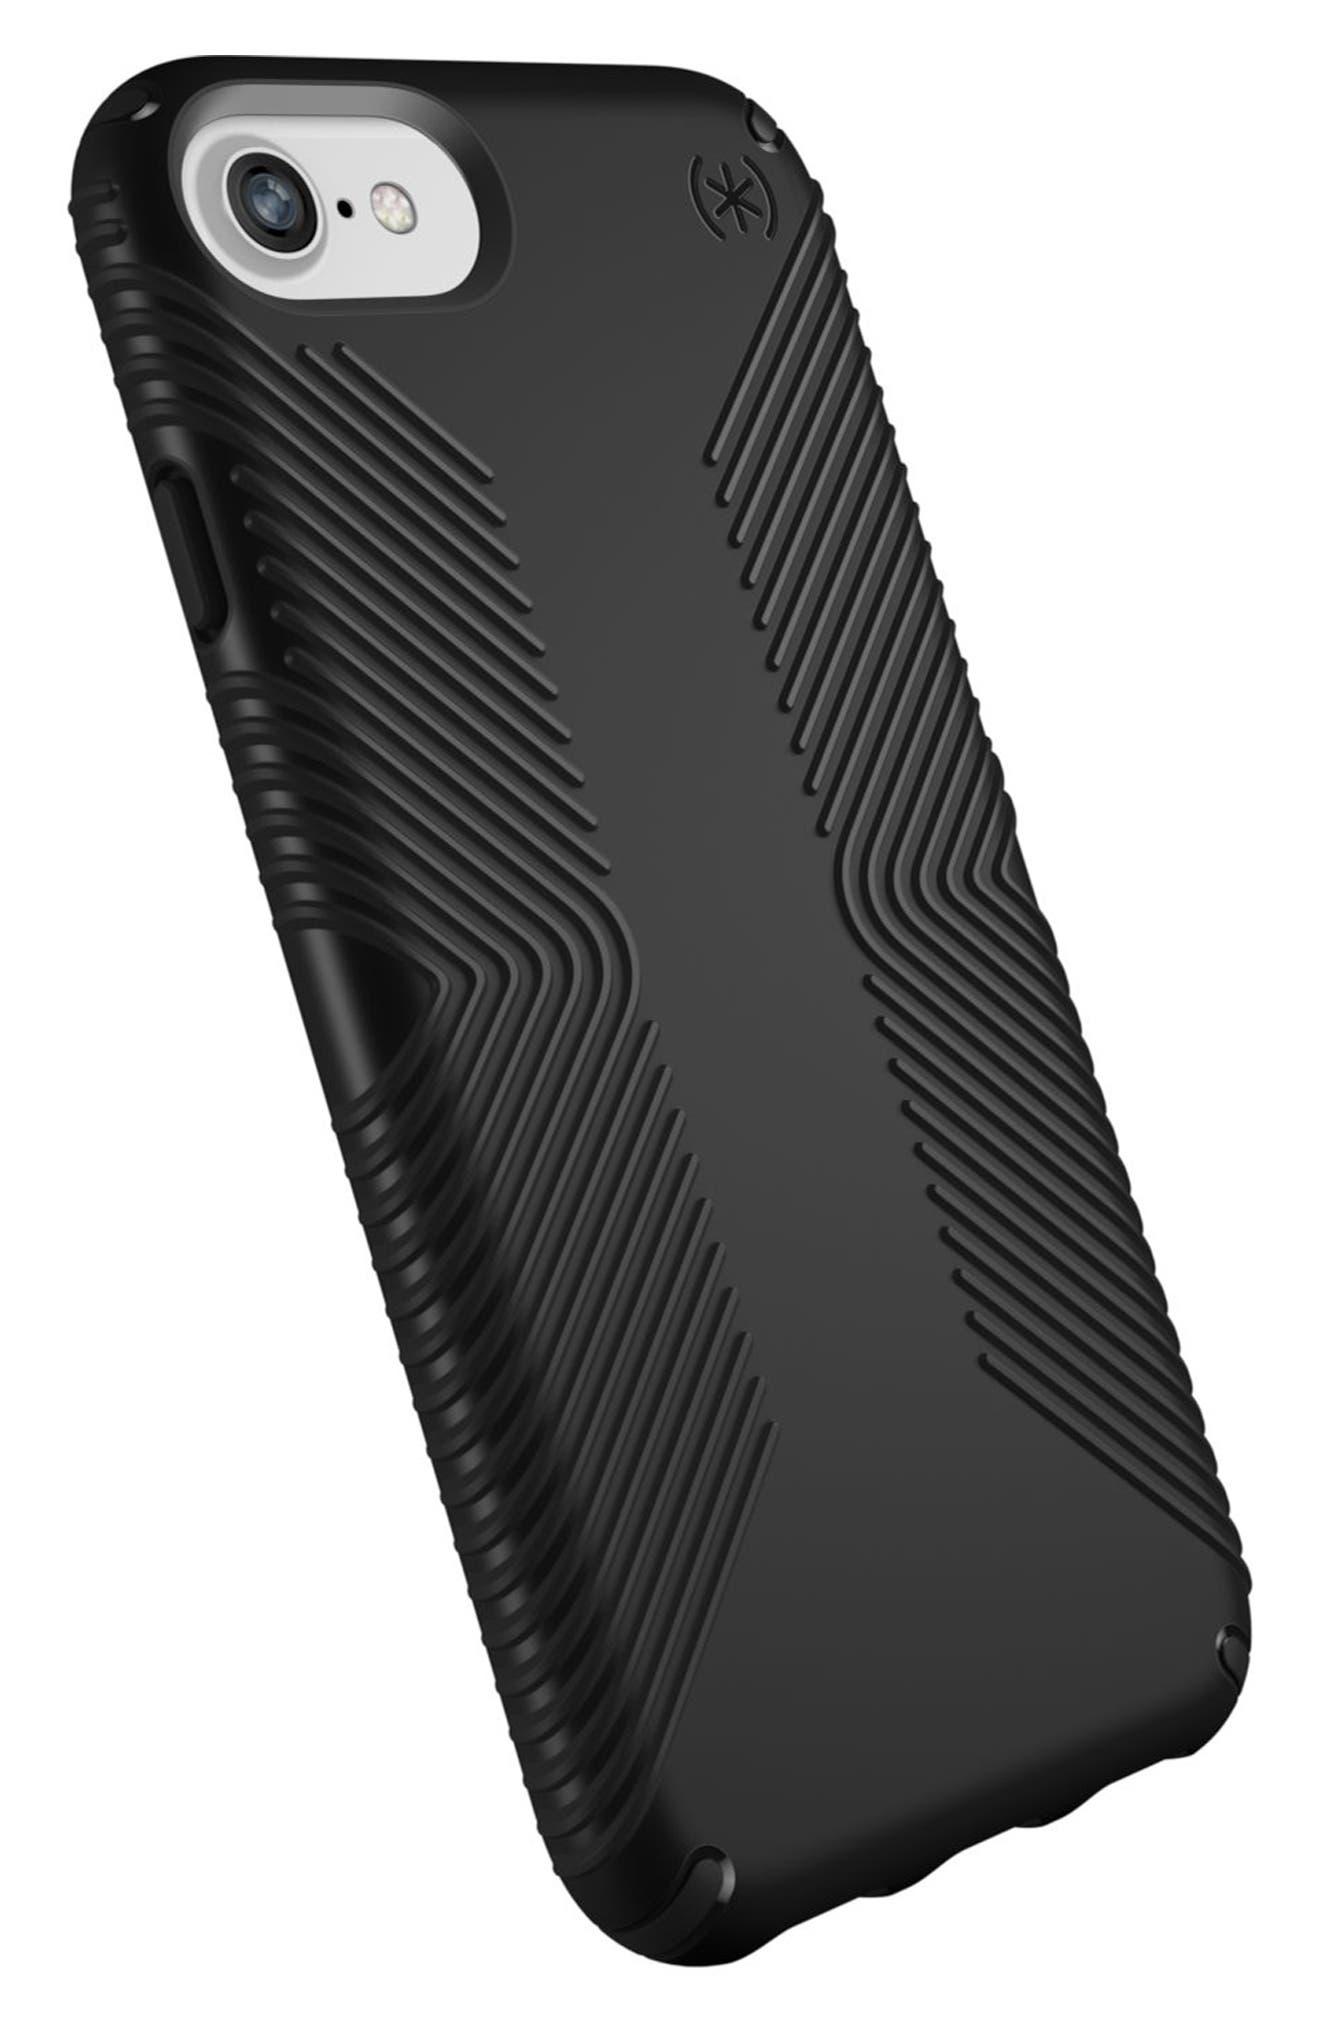 SPECK, Grip iPhone 6/6s/7/8 Case, Alternate thumbnail 5, color, 001